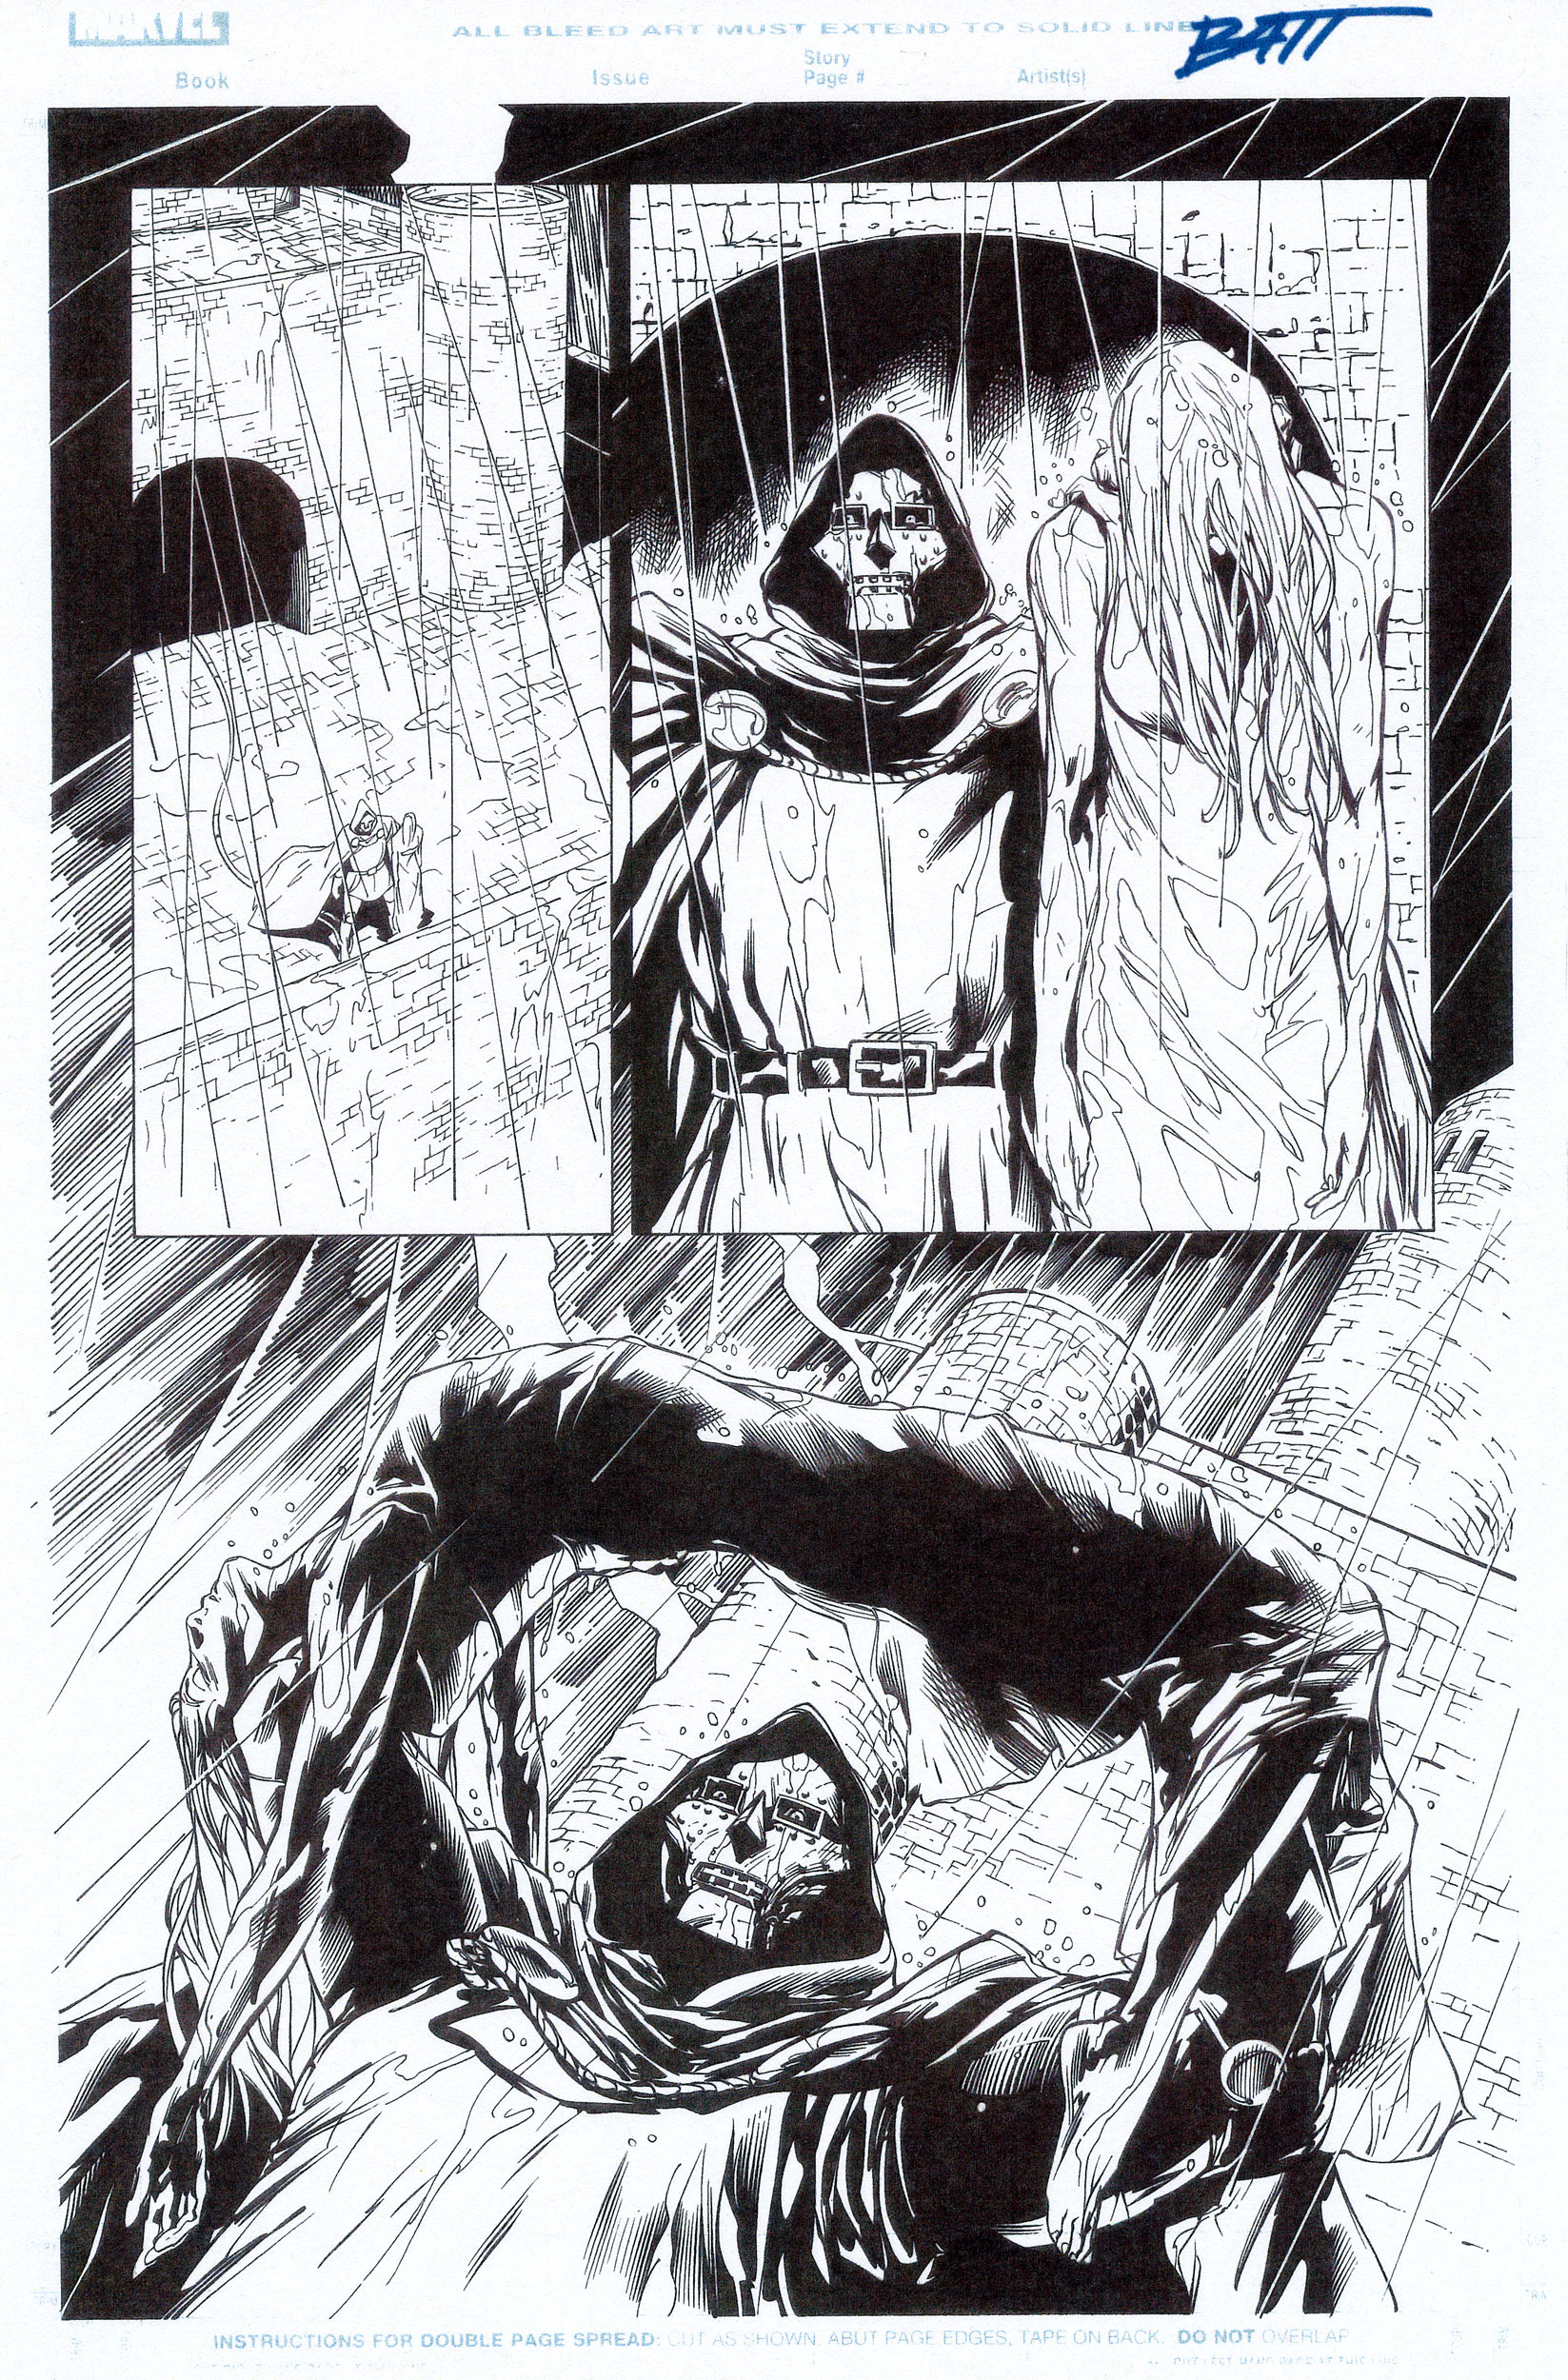 BILLY TAN 2010 THOR #605 P.7 Comic Art